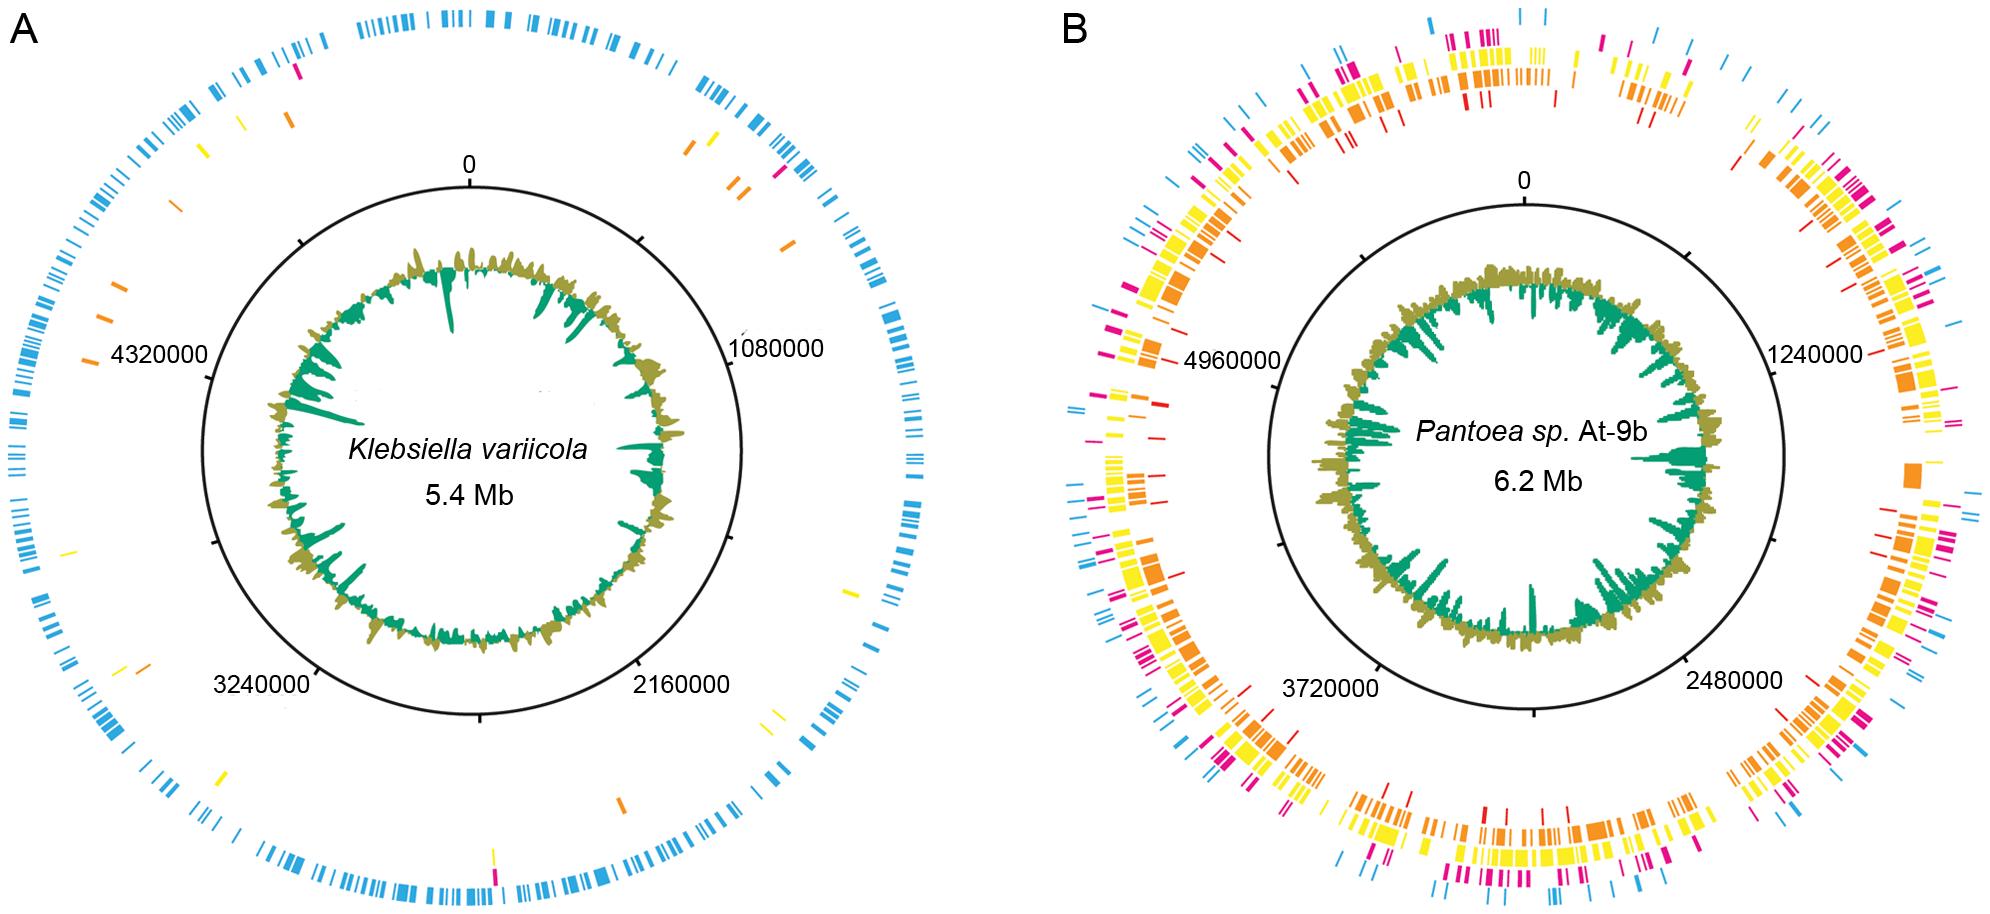 Leaf-cutter ant fungus garden metagenome recruitment analysis.